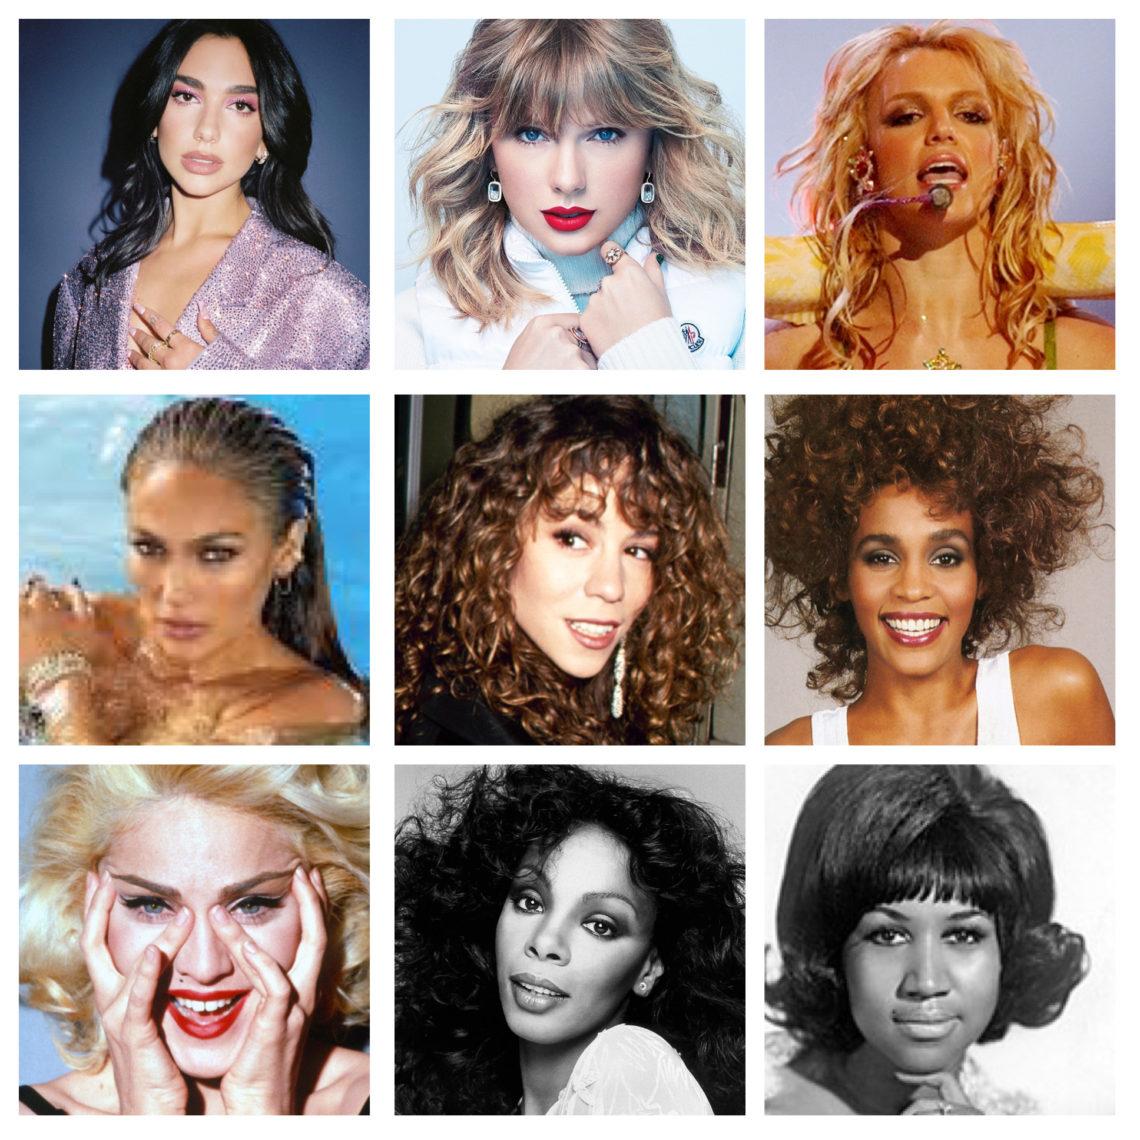 Best Pop Music Diva